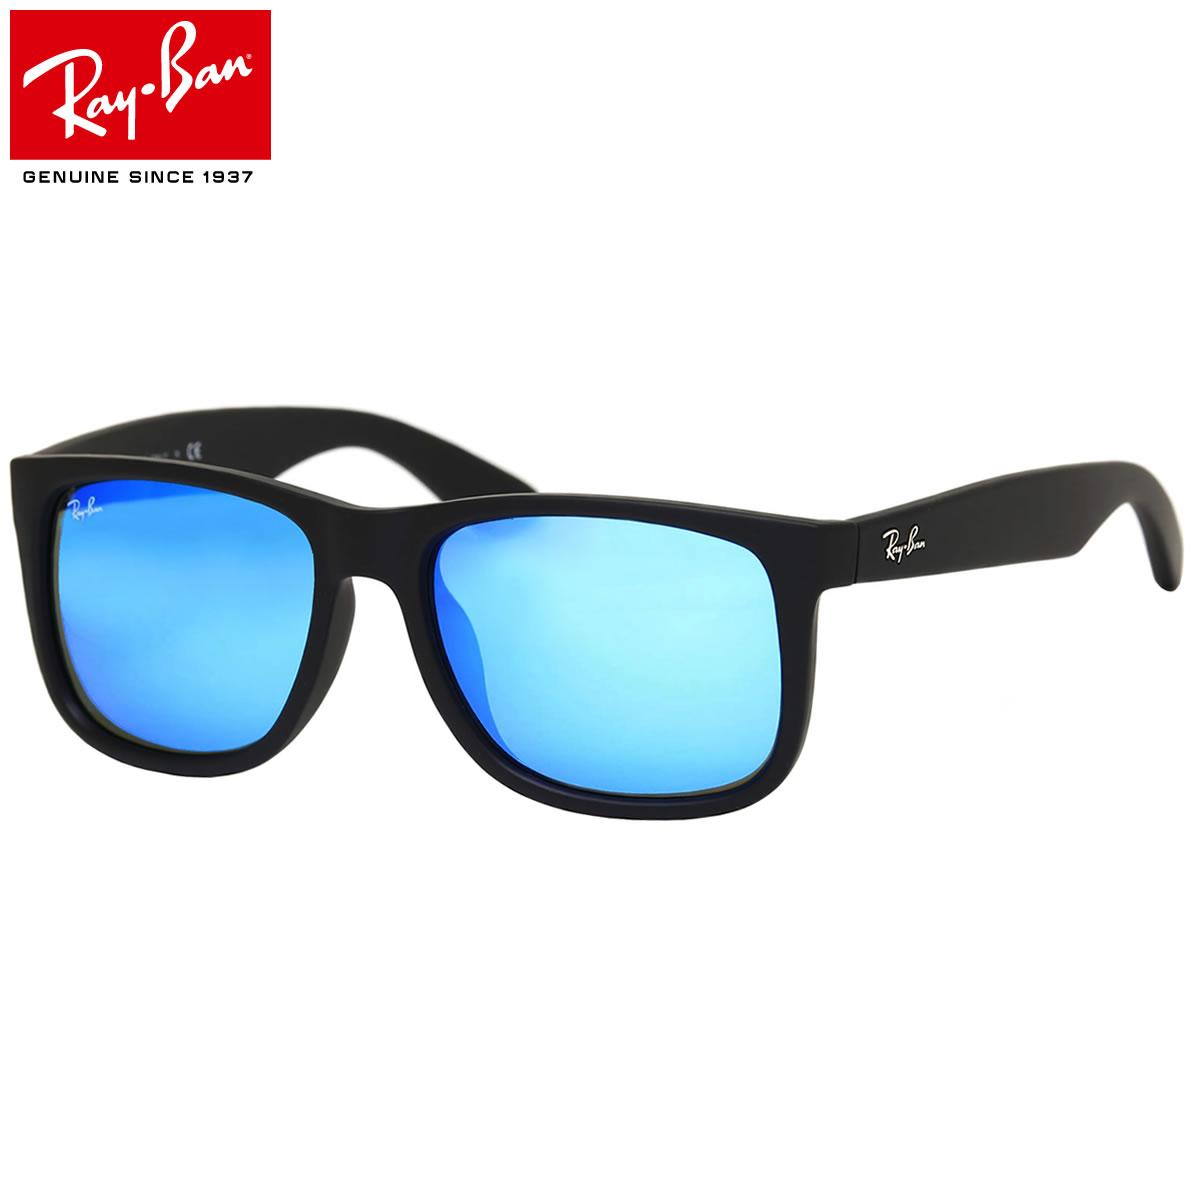 ray ban justin matte blue